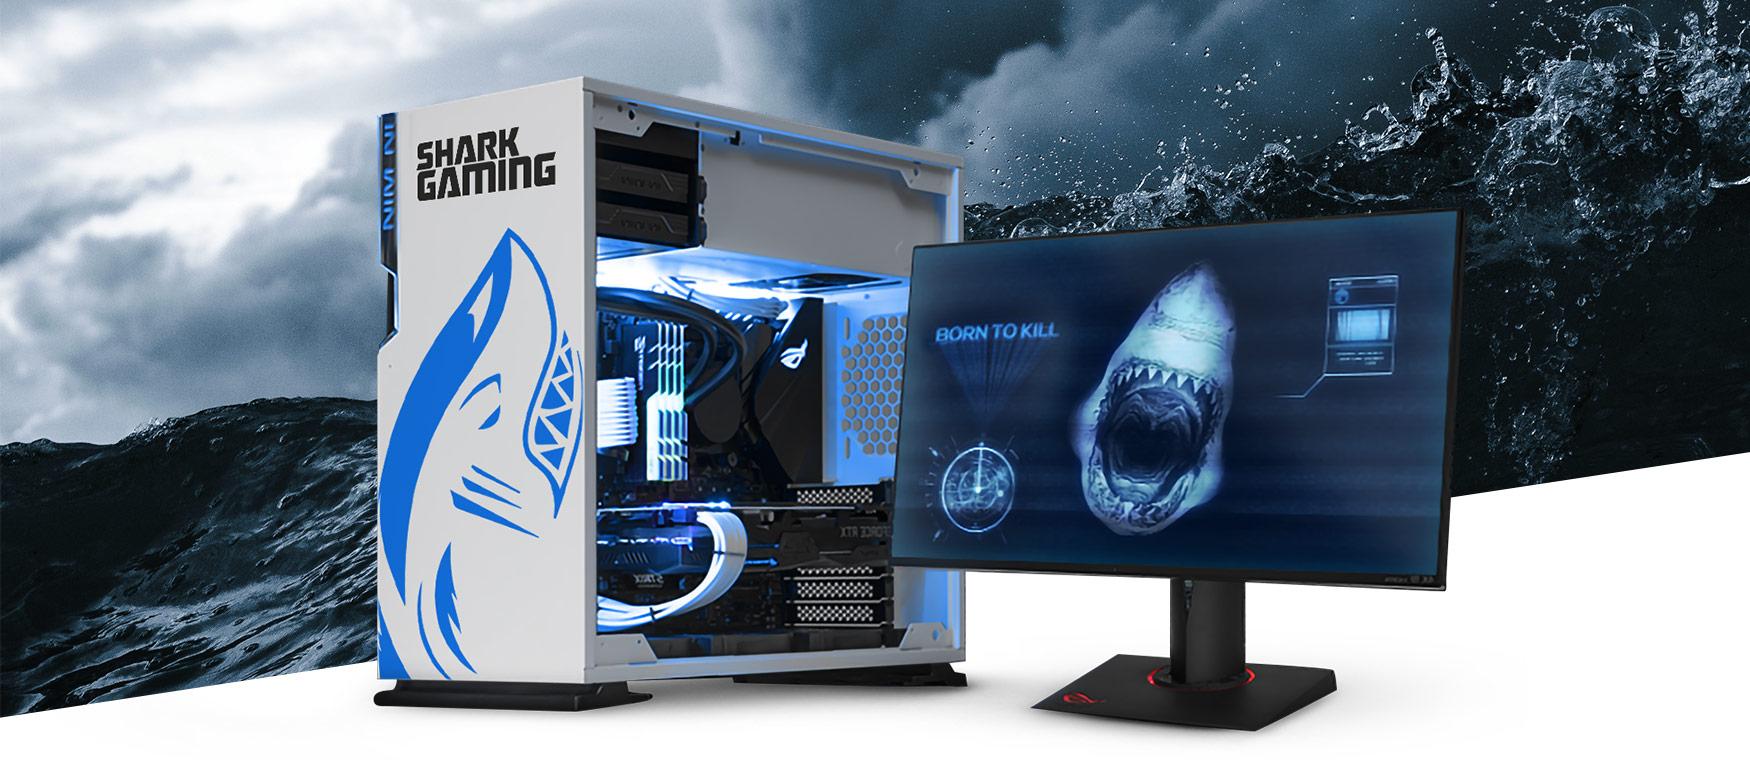 Producing Custom Gaming PCs with Original Designs On-Demand